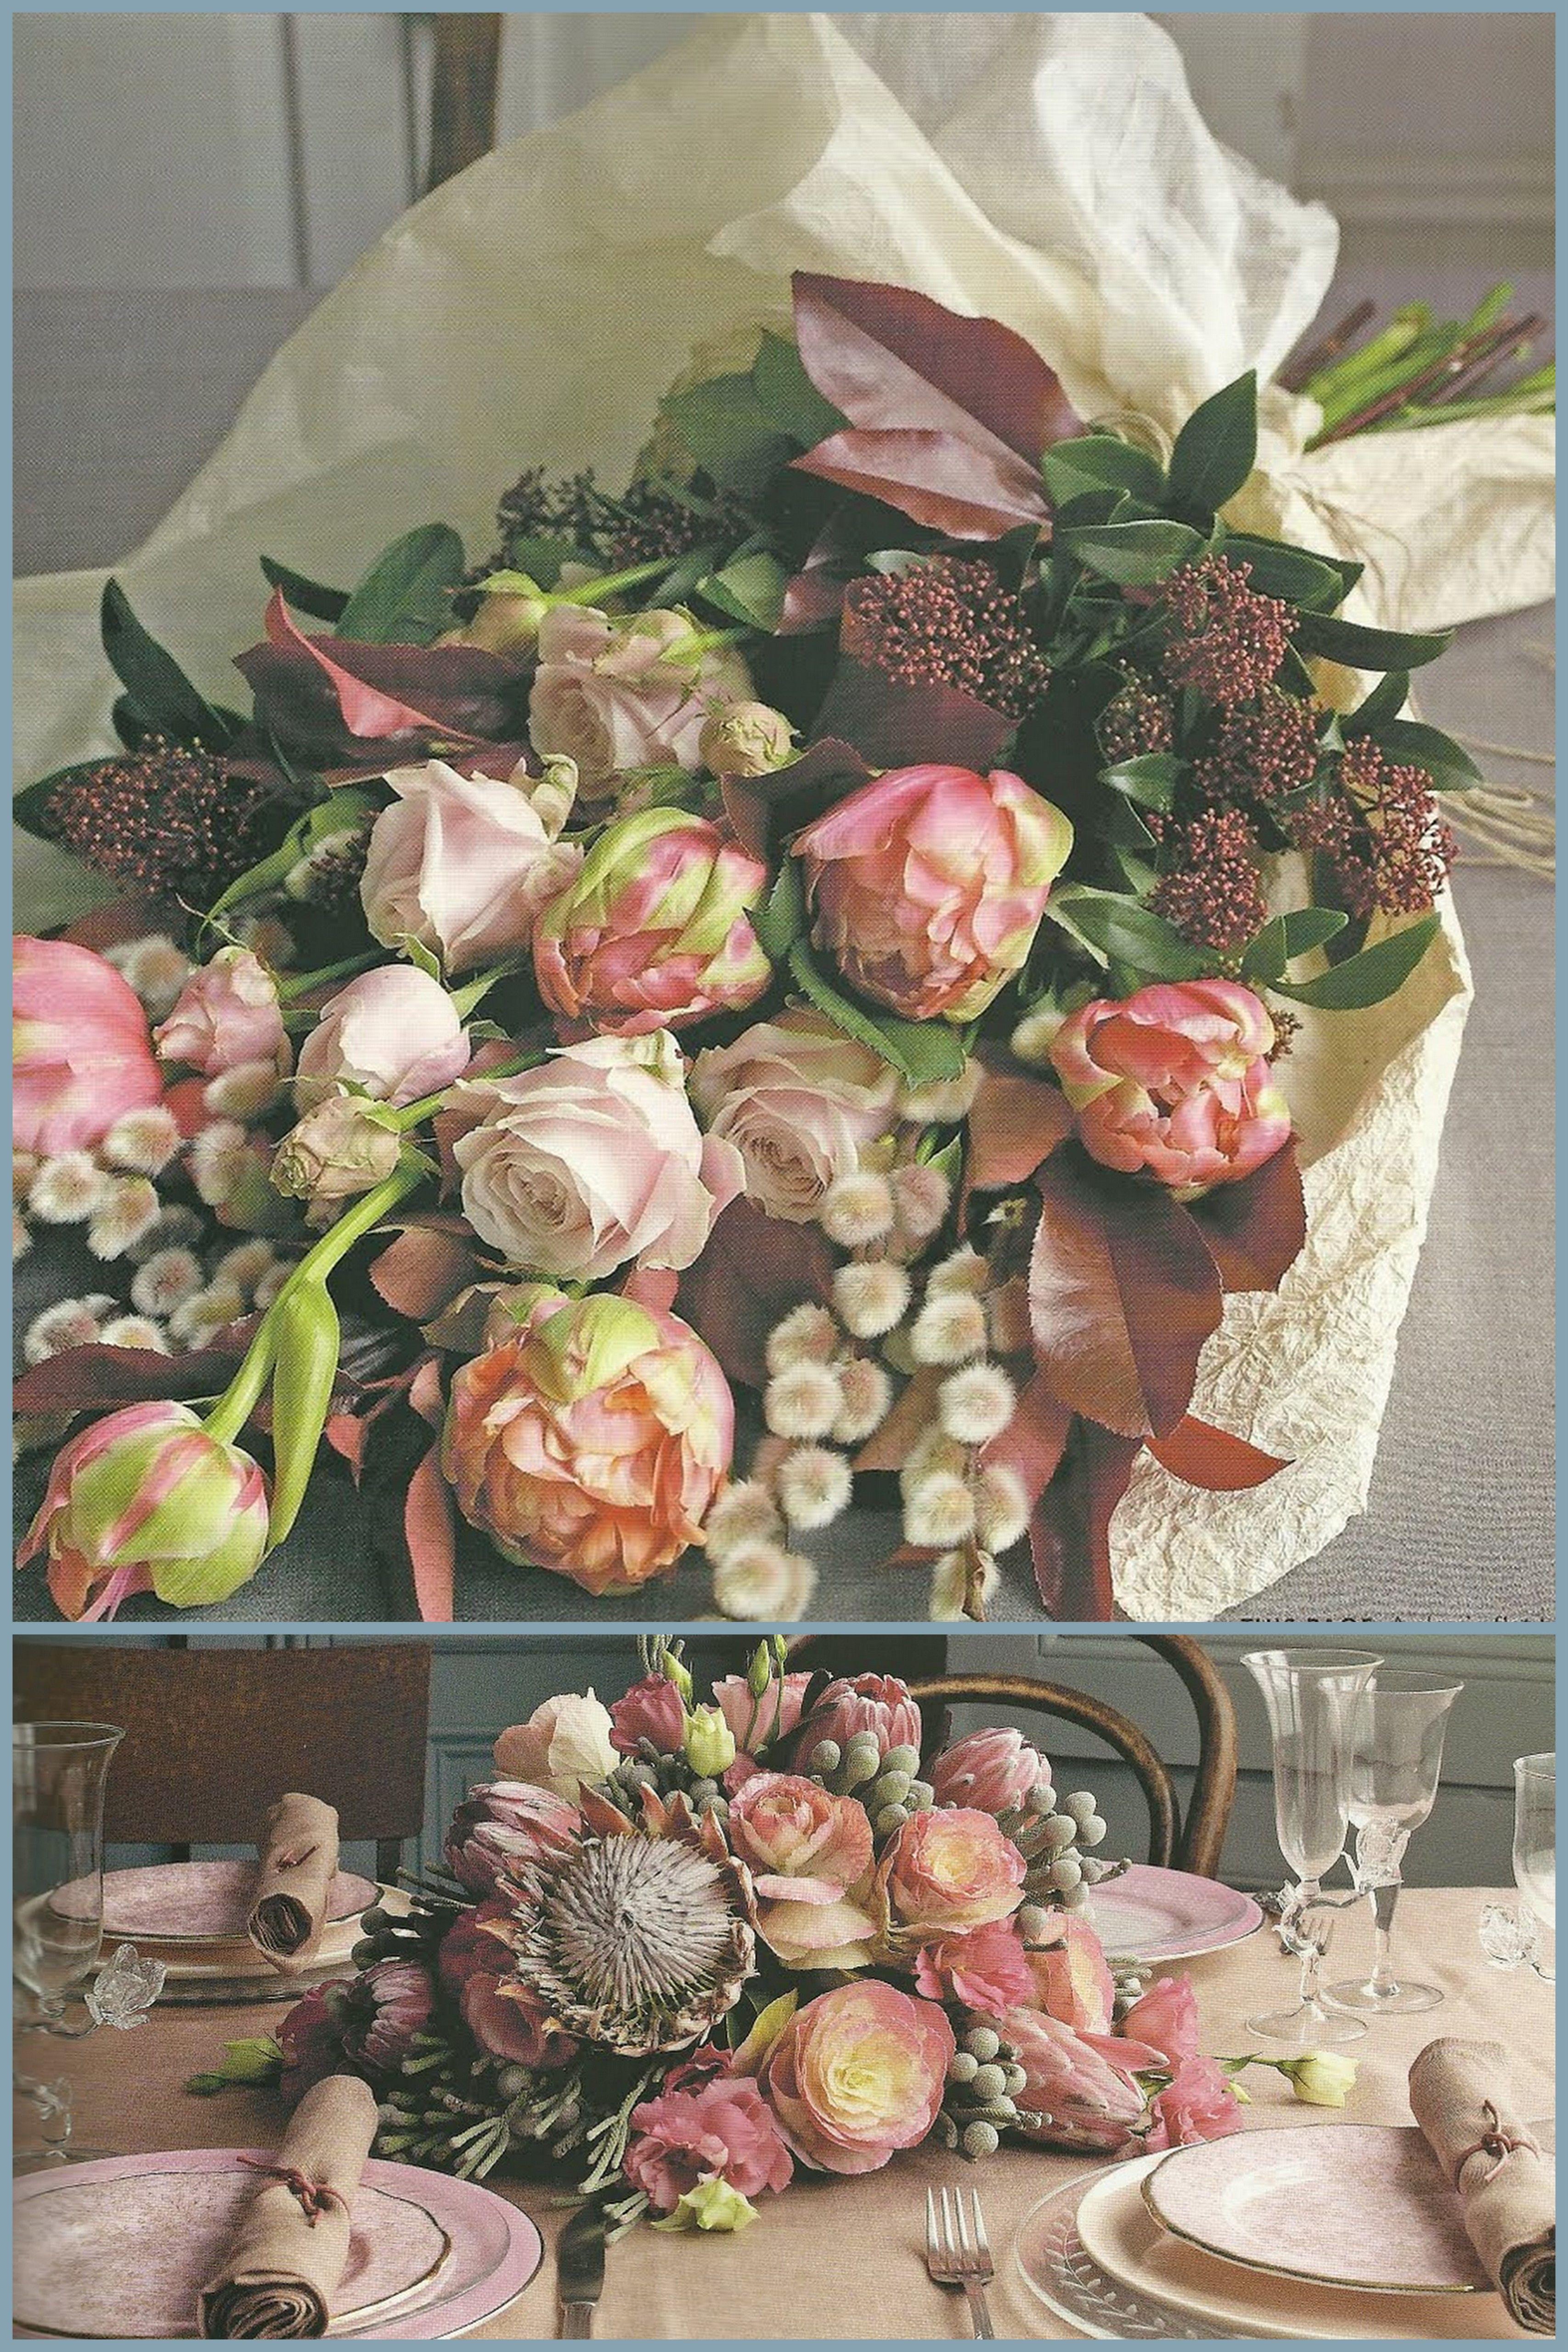 Jane packer tulip flower arrangements google search flower jane packer tulip flower arrangements google search wedding bouquets wedding flowers pretty flowers izmirmasajfo